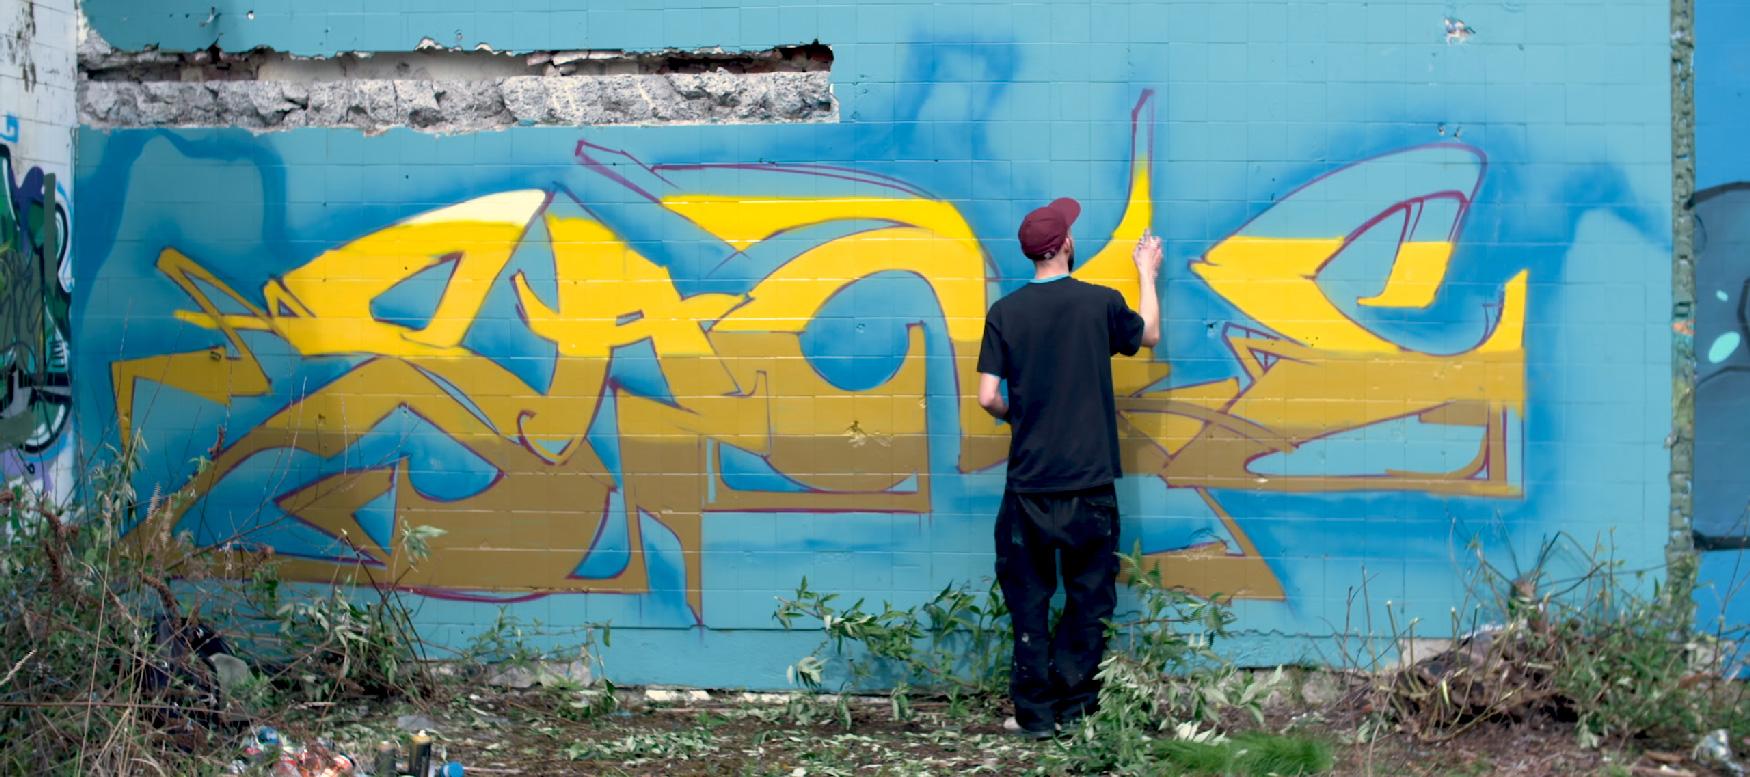 banniere-Street-art-2